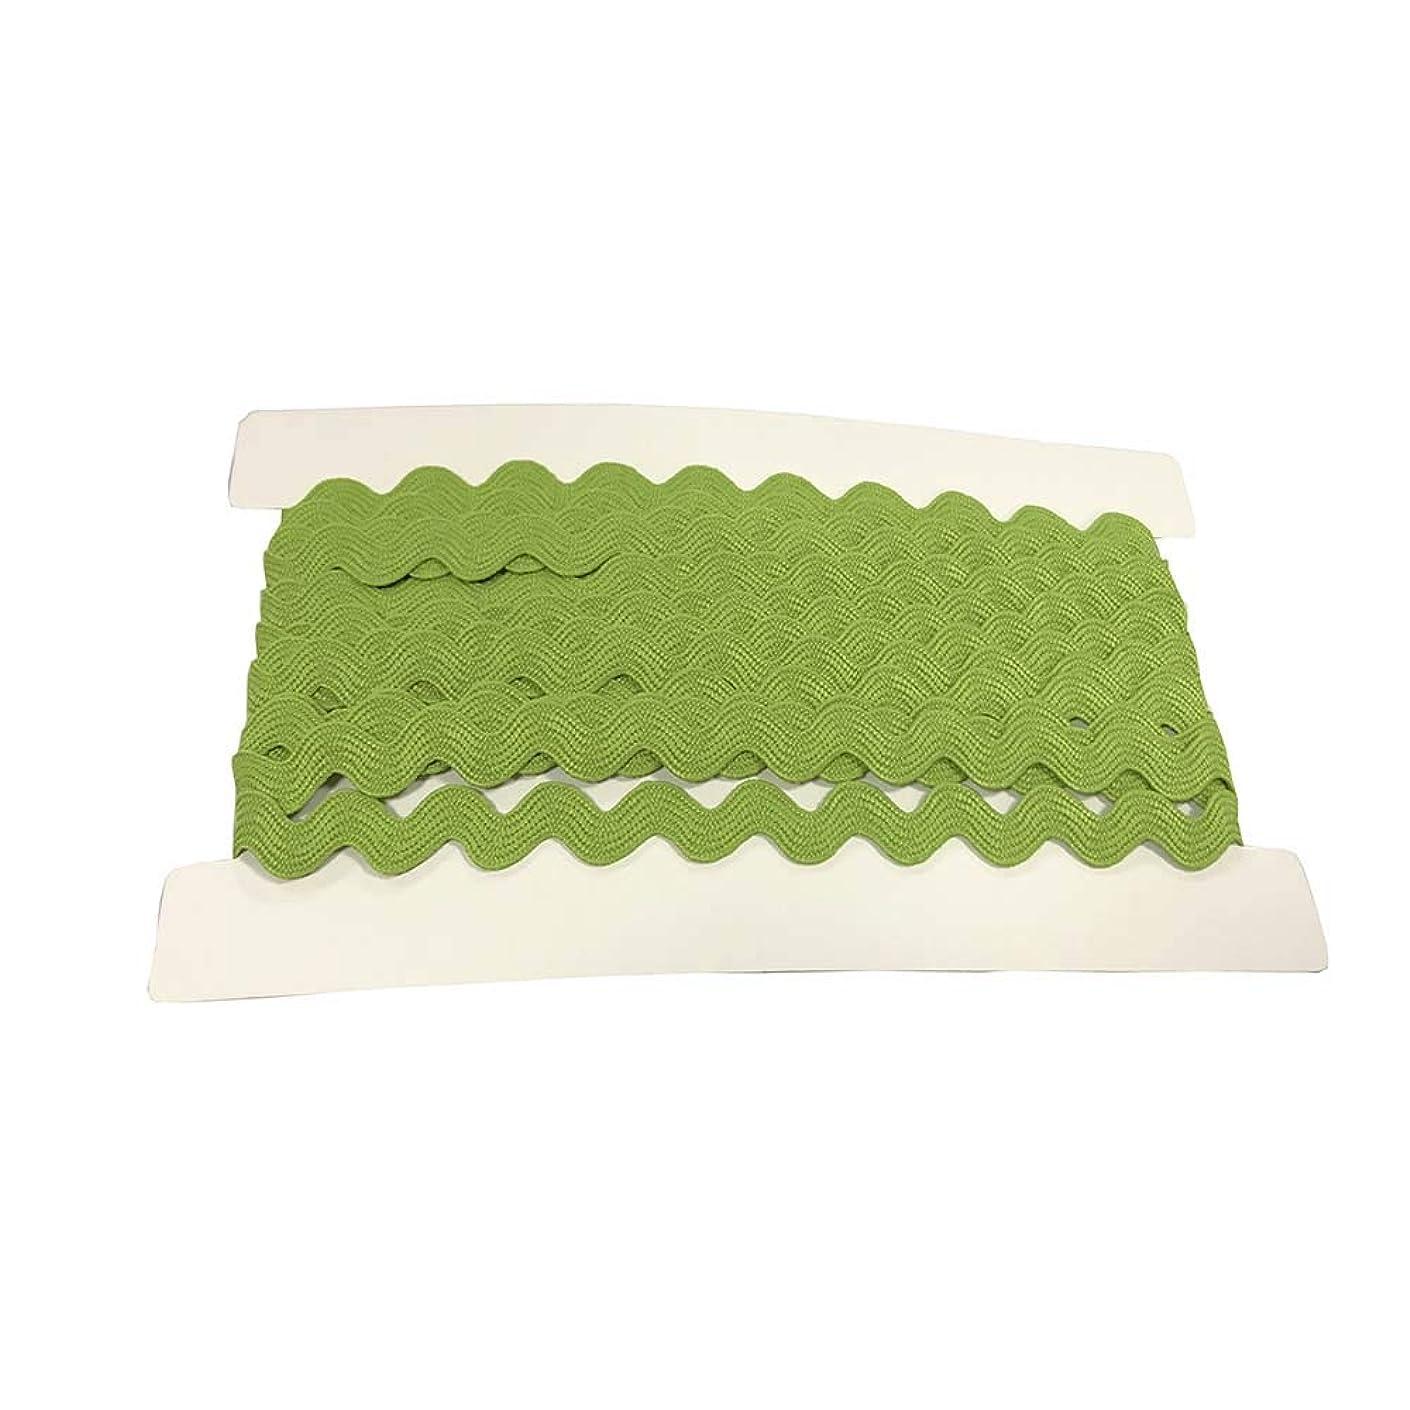 Rick Rack Trim 12mm Width Polyester Baby Ric Rac Trim Green, 5M per Cards